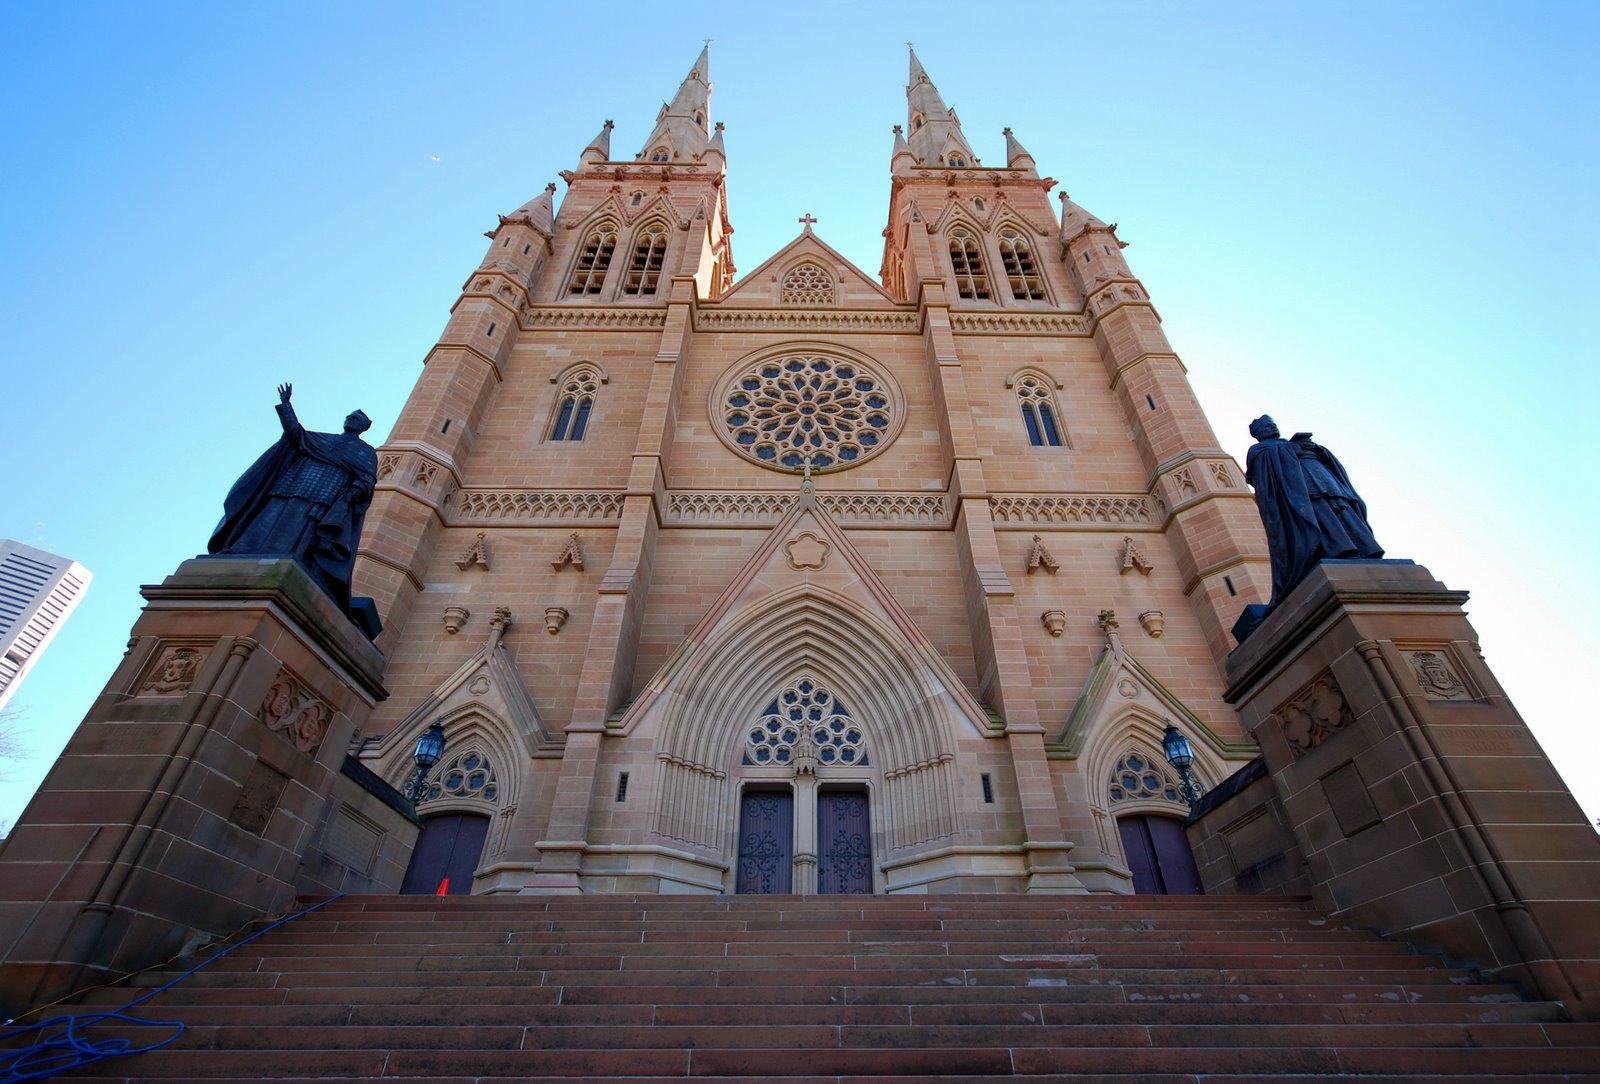 Saint Marys Australia  City new picture : vexilla regis: September 2011